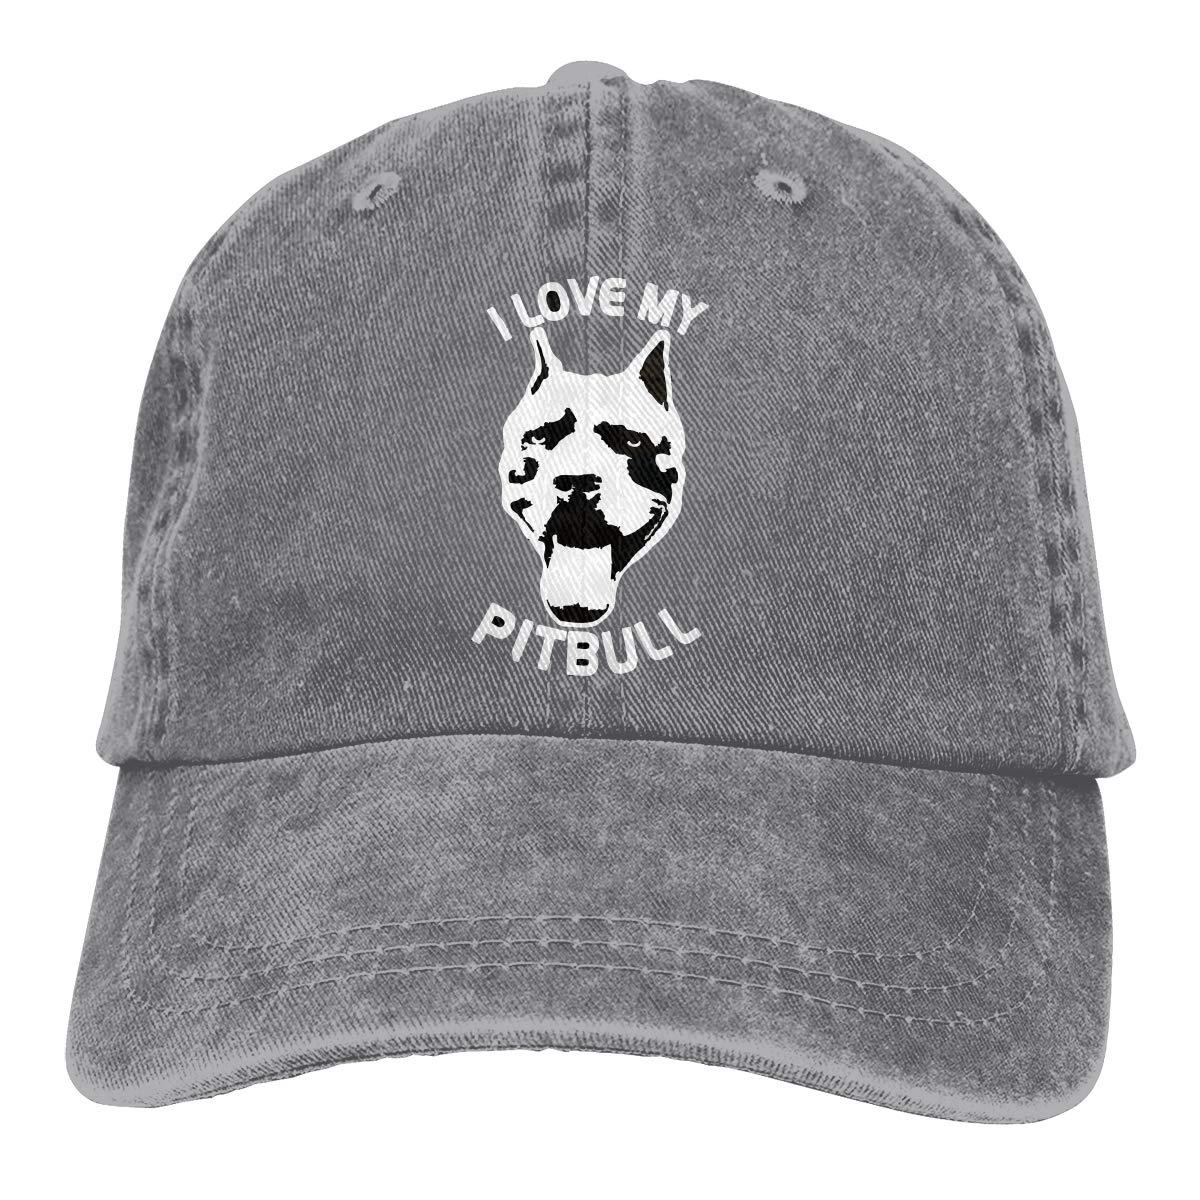 I Love My Pitbull Unisex Personalize Cowboy Hip Hop Cap Adjustable Baseball Cap